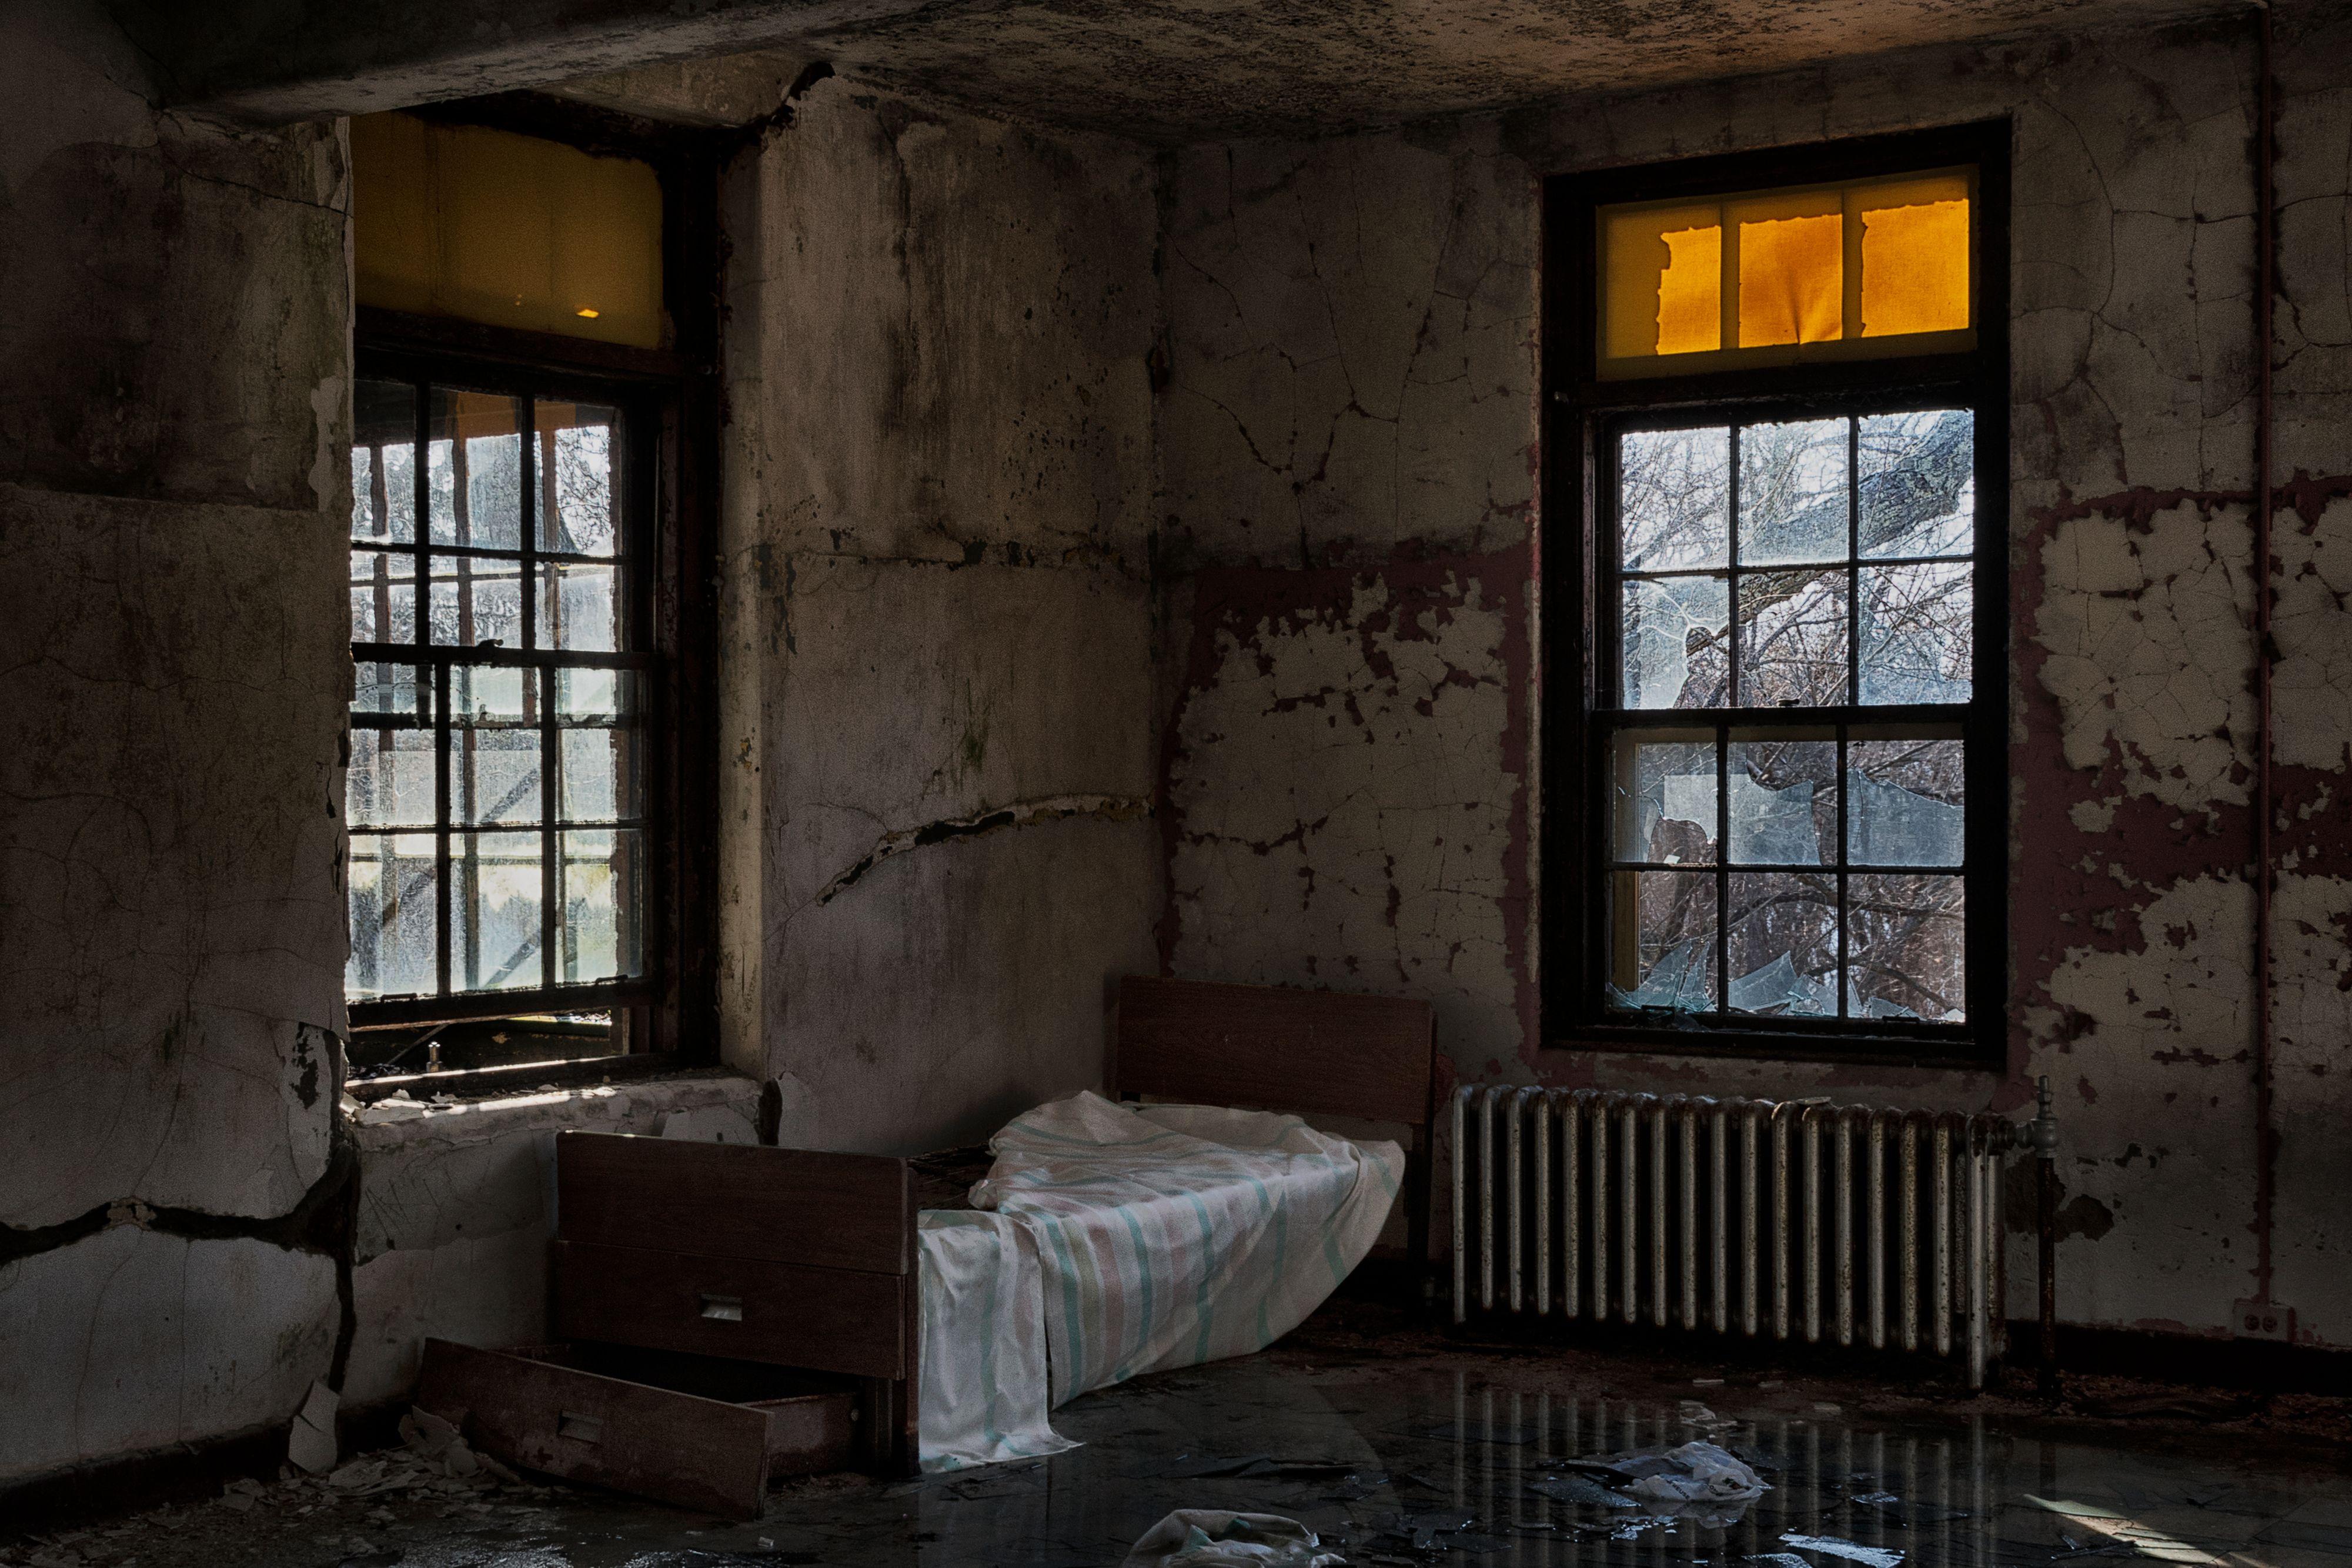 Where_Did_You_Sleep_Last_Night?.jpg